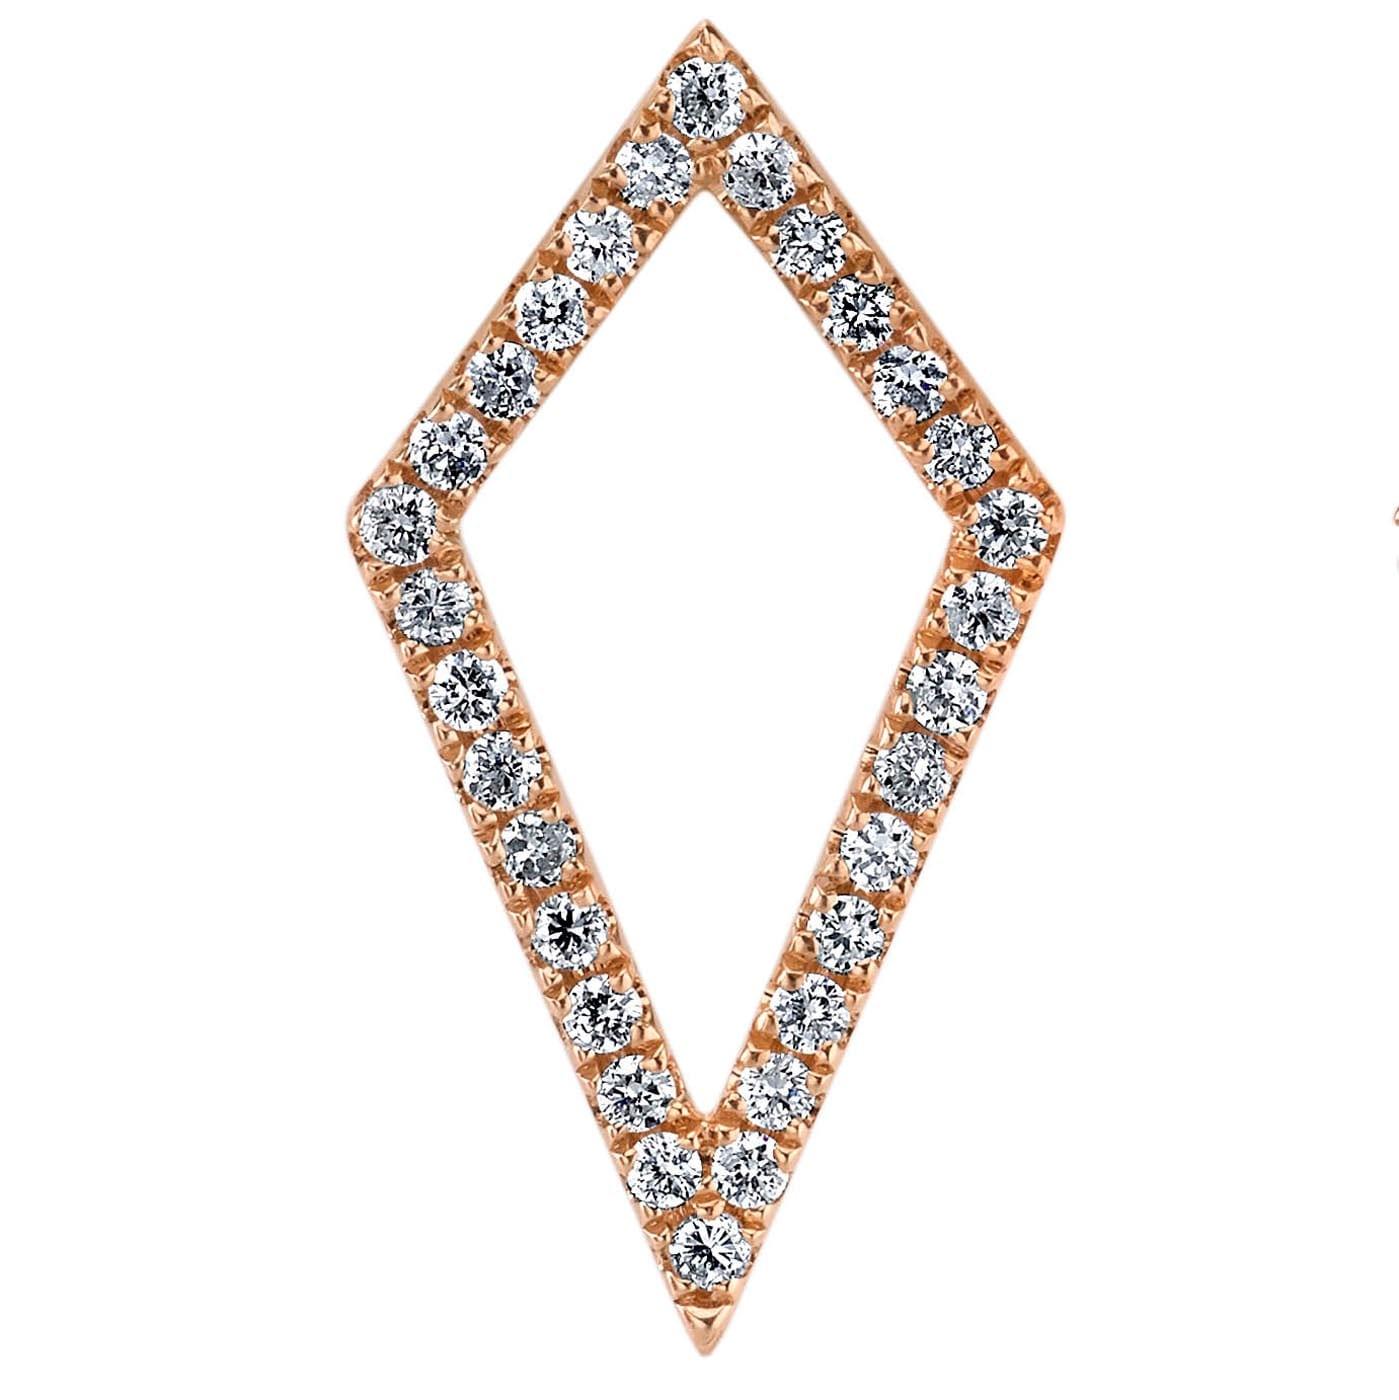 Diamond Earrings - Drops & Dangles Style #: MARS-26840